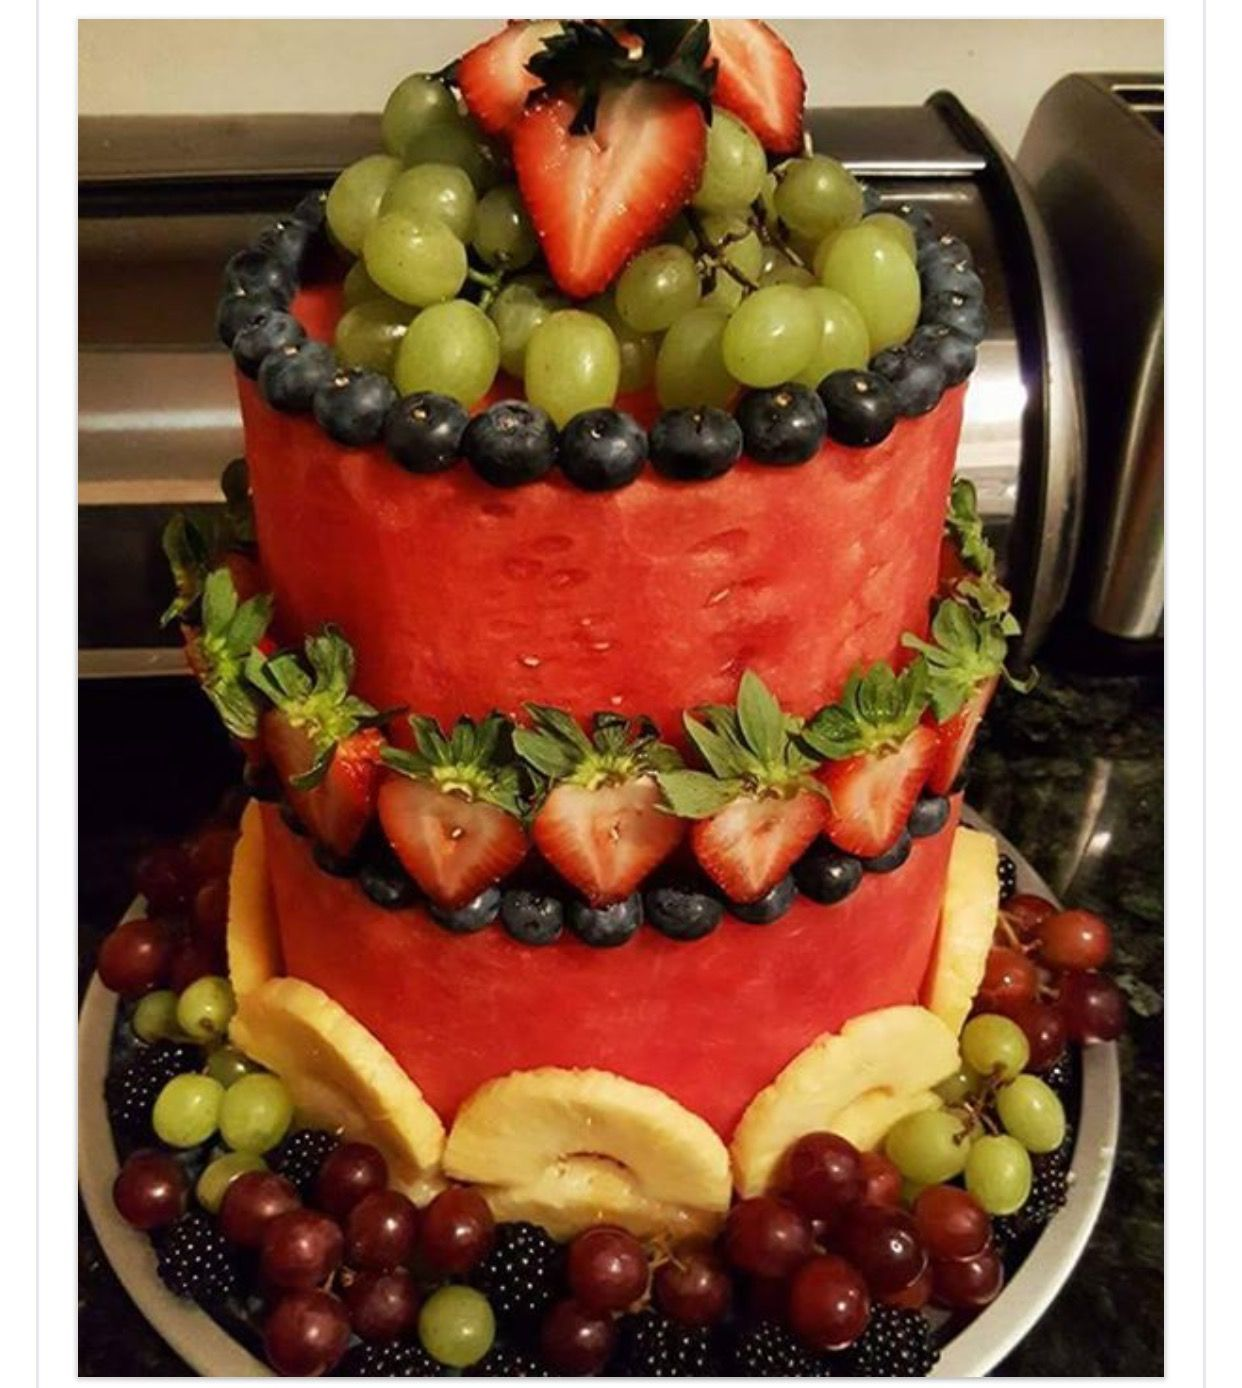 Pin by pauline bloom on FOOD Pinterest Fruit cakes Healthy